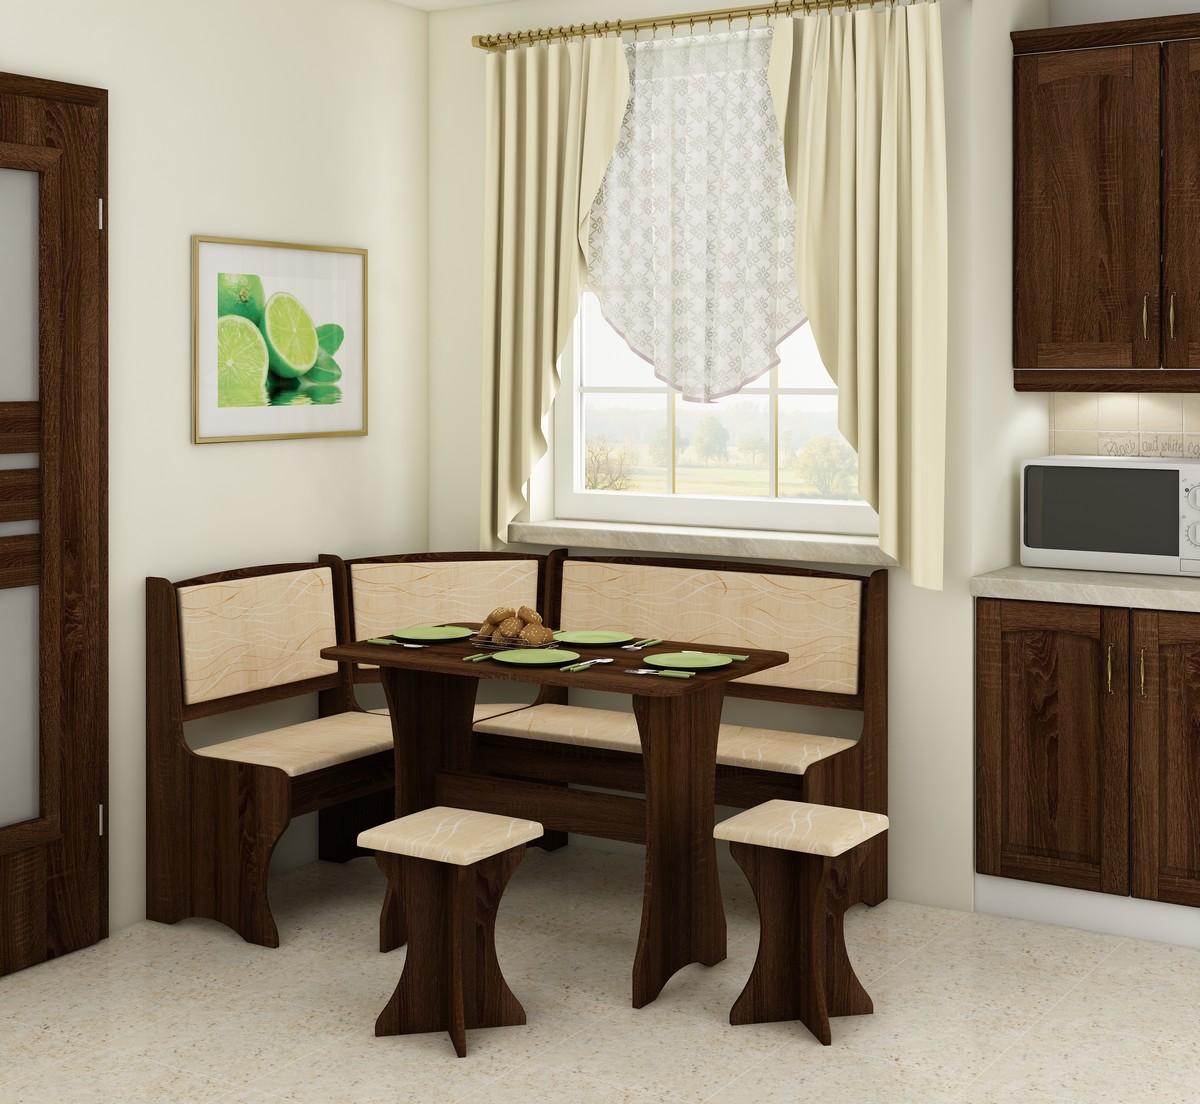 Rohový jídelní set - WIP - dub sonoma tmavá + monaco (s taburetkami) (pro 5 osob)